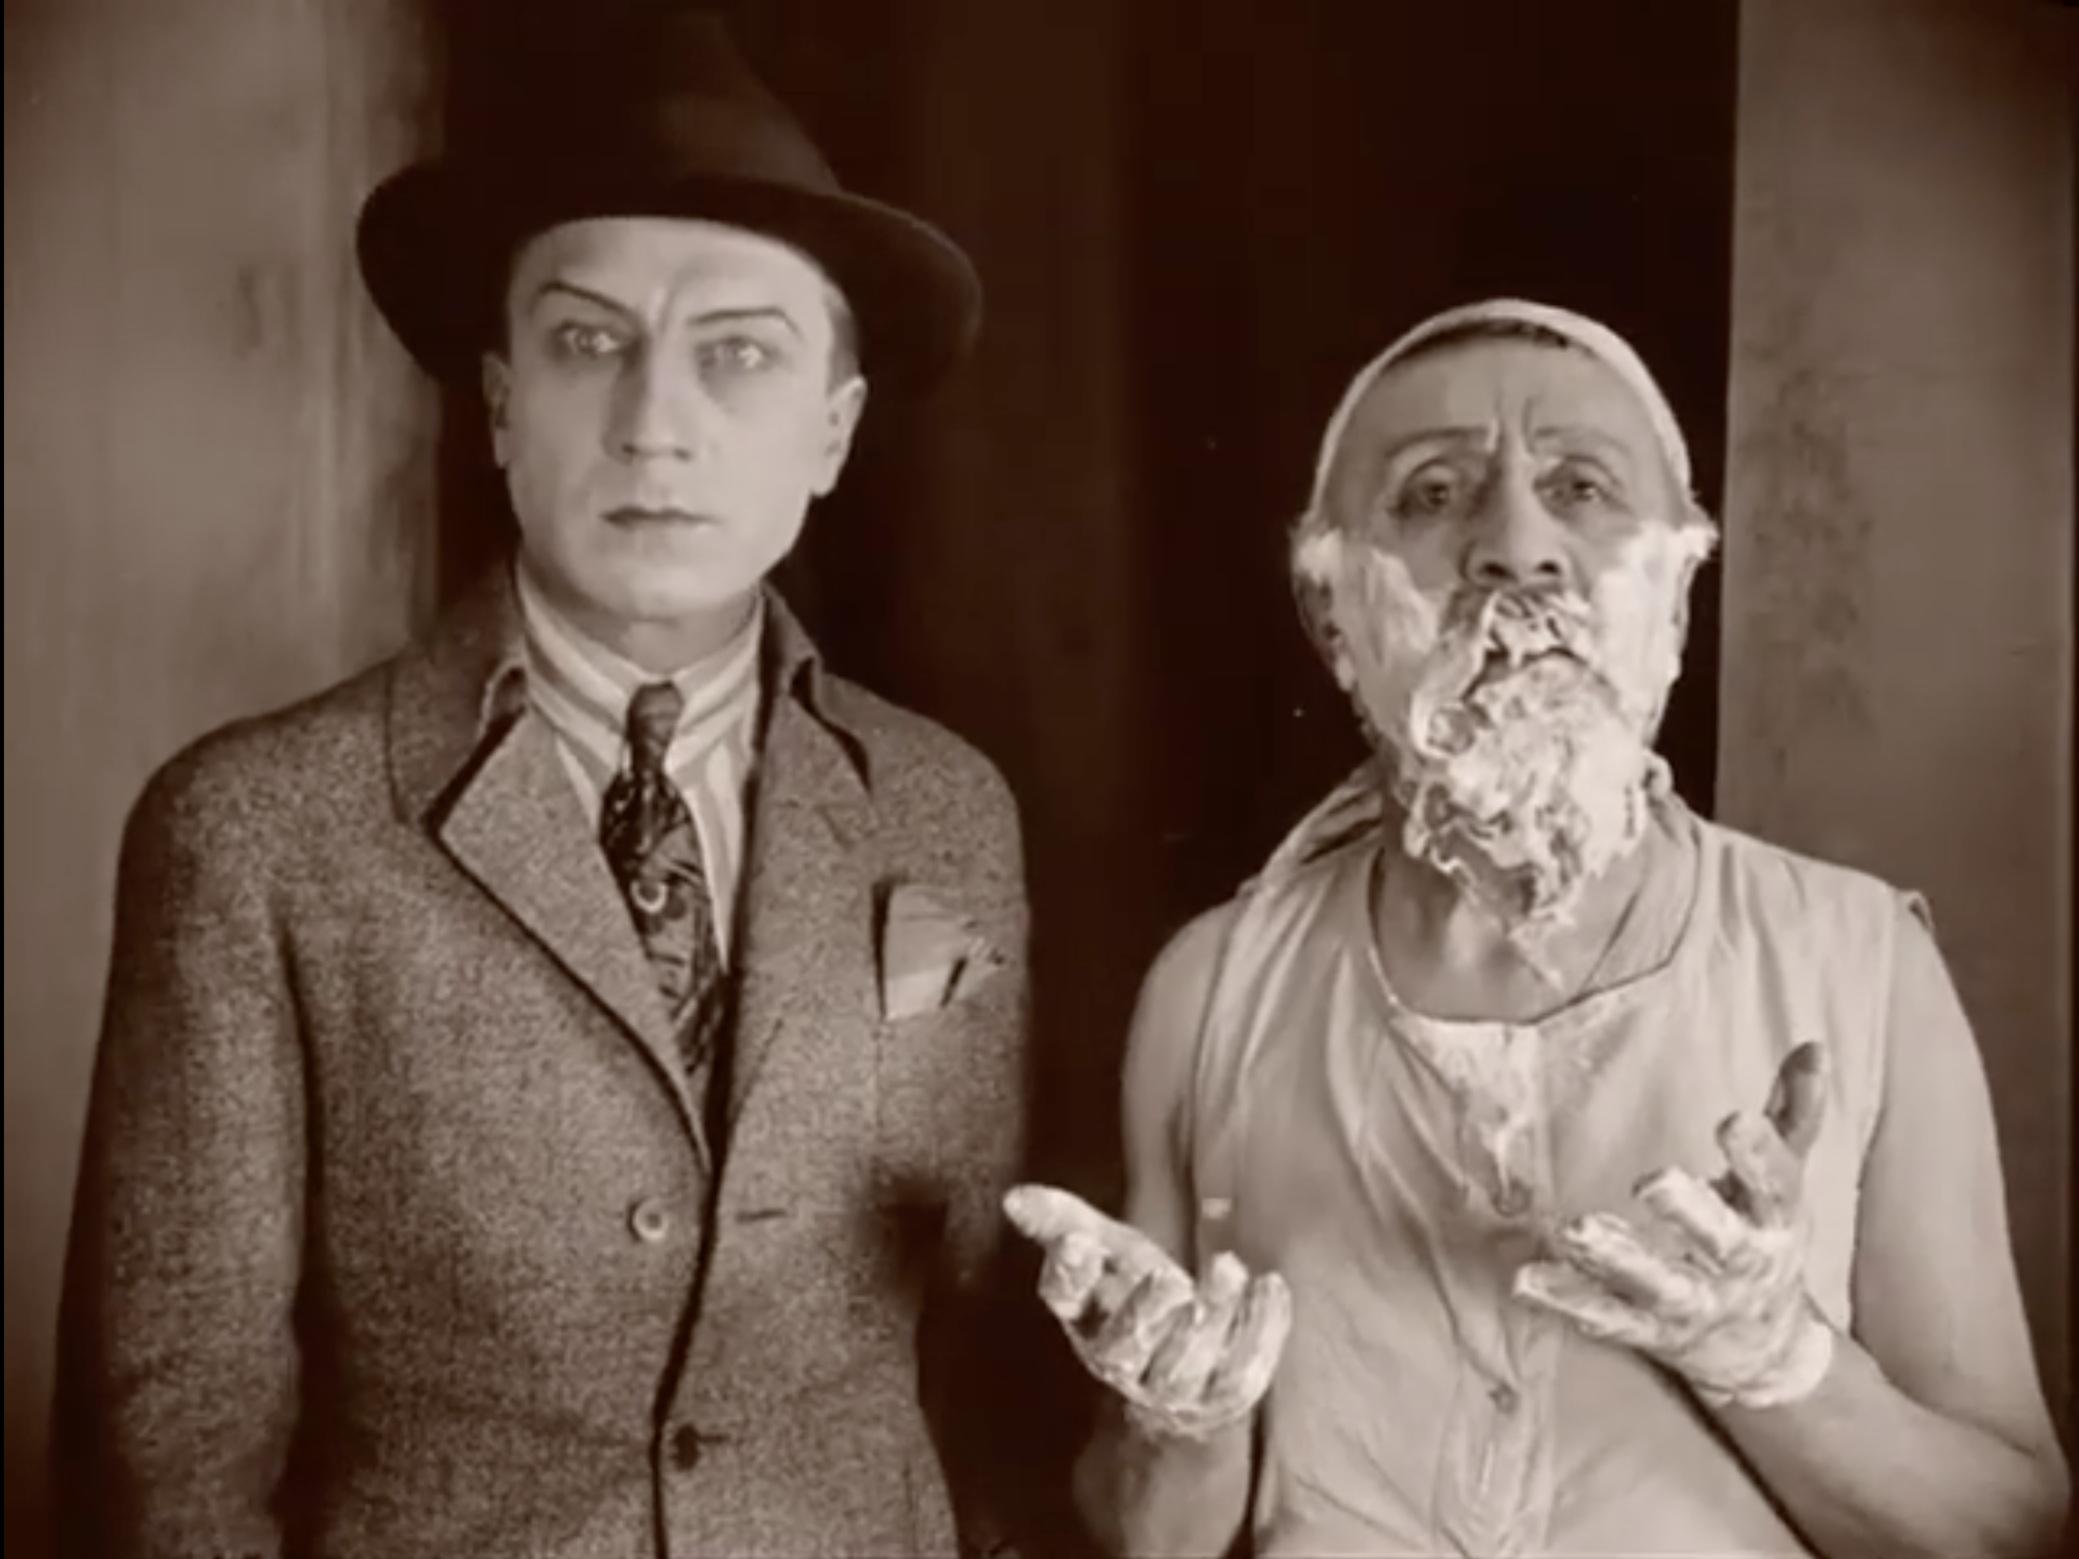 The Living Dead Man (1925) by director Marcel L'Herbier (Credit: Films aRMOR)